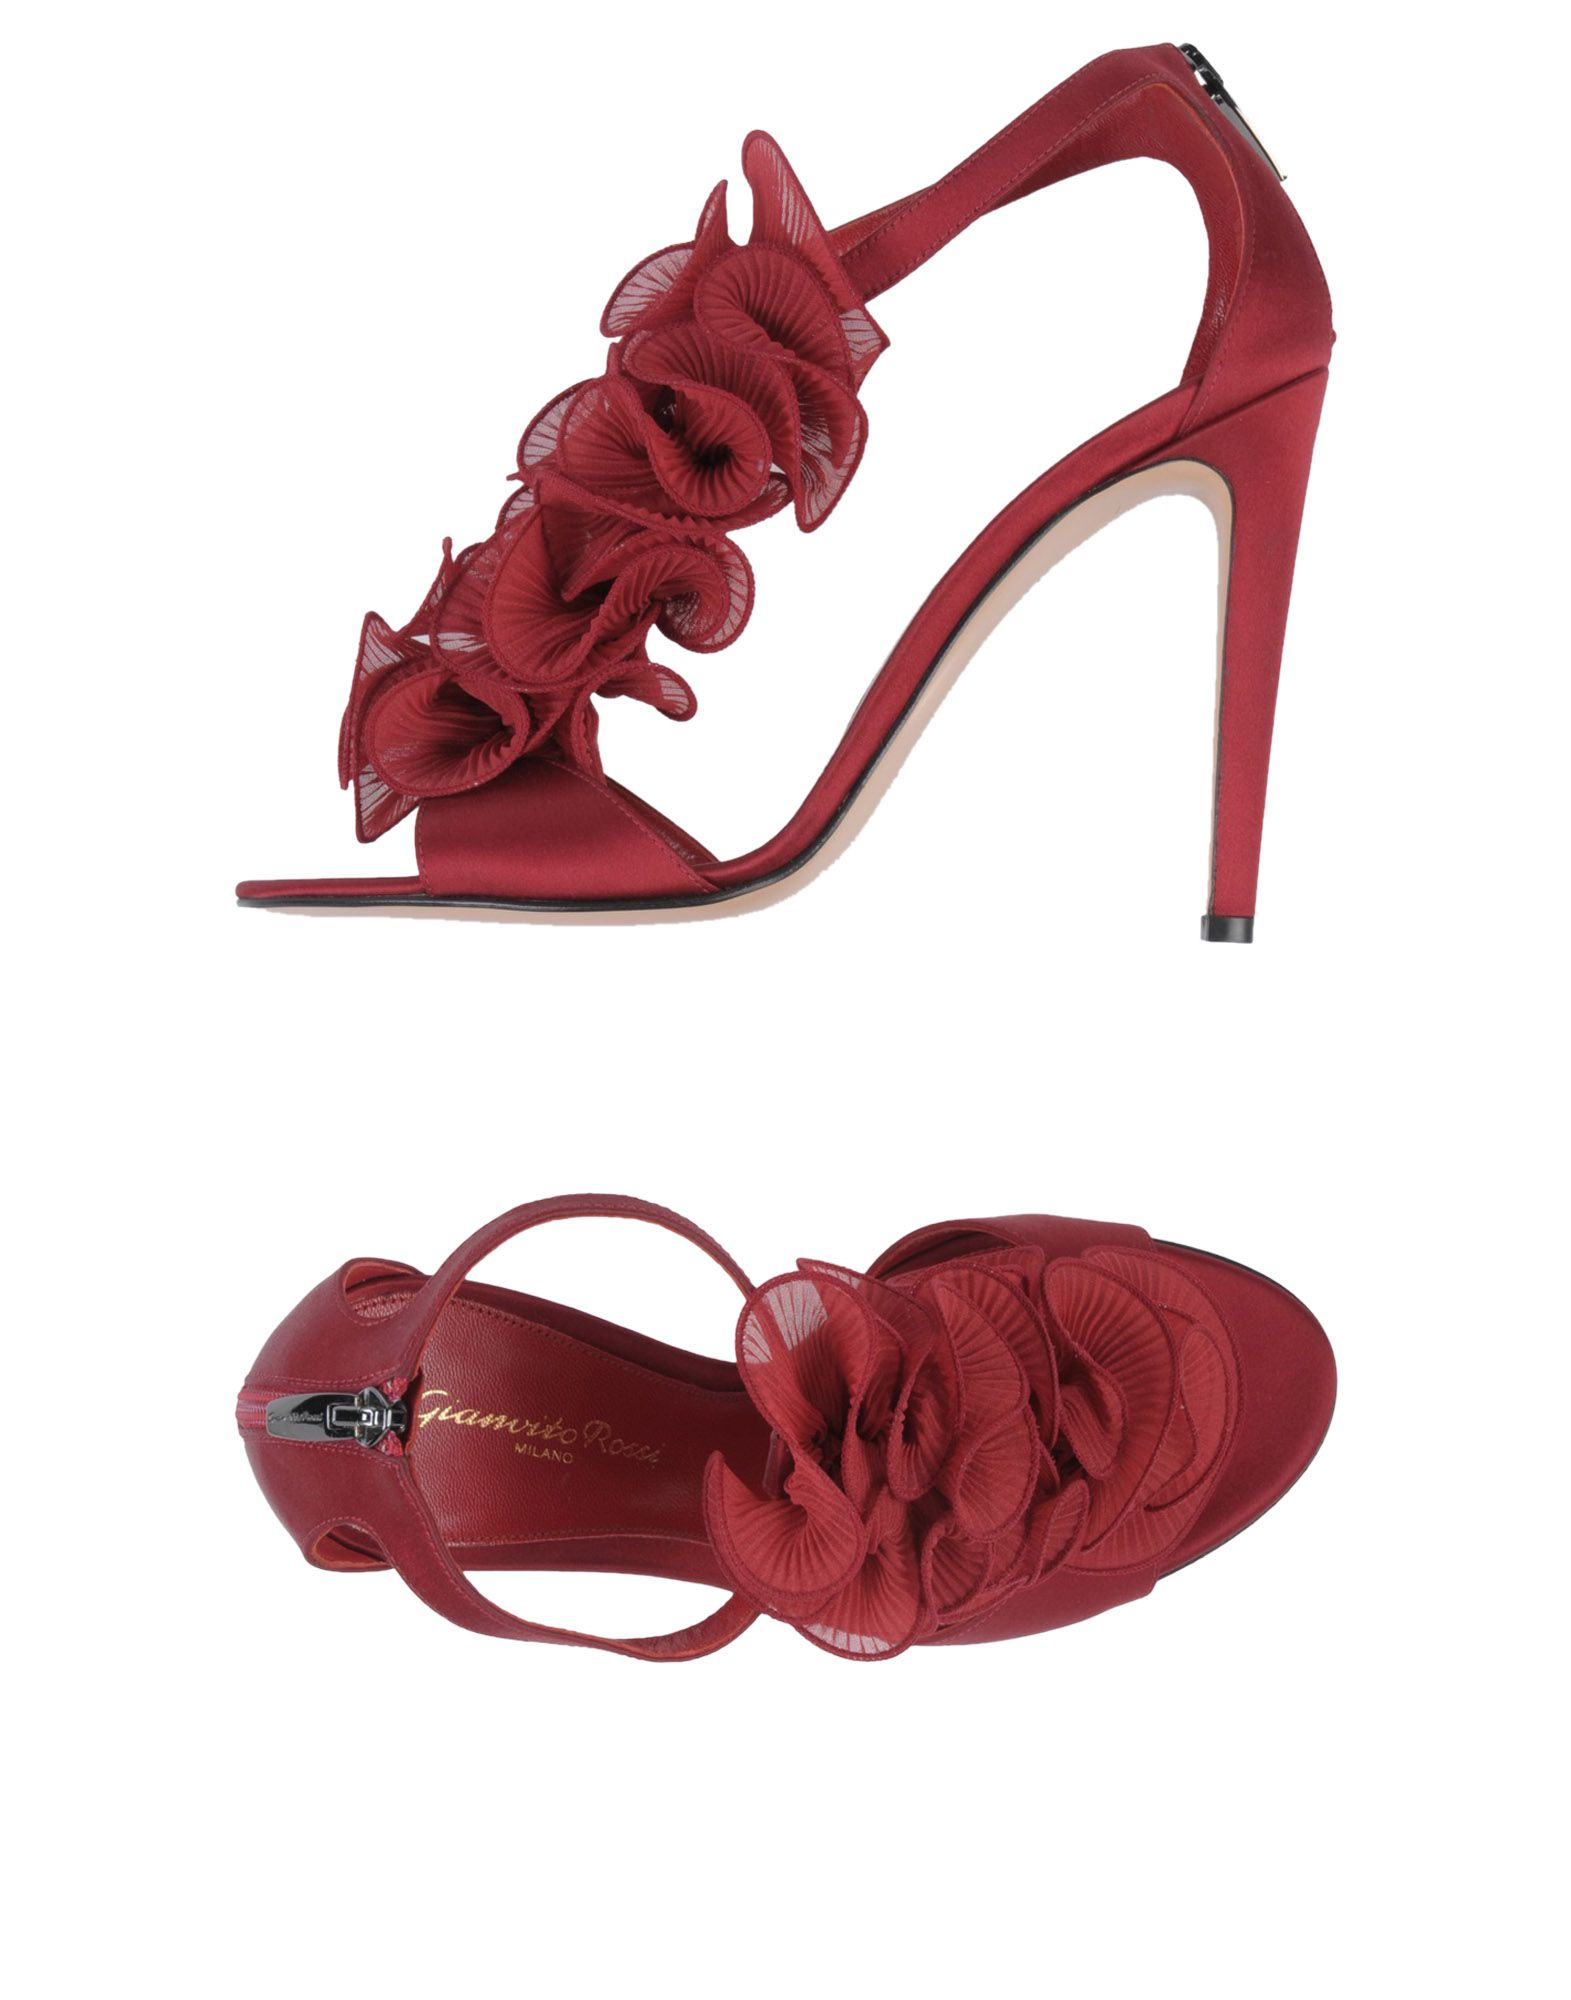 GIANVITO ROSSI Damen Sandale Farbe Bordeaux Größe 8 jetztbilligerkaufen